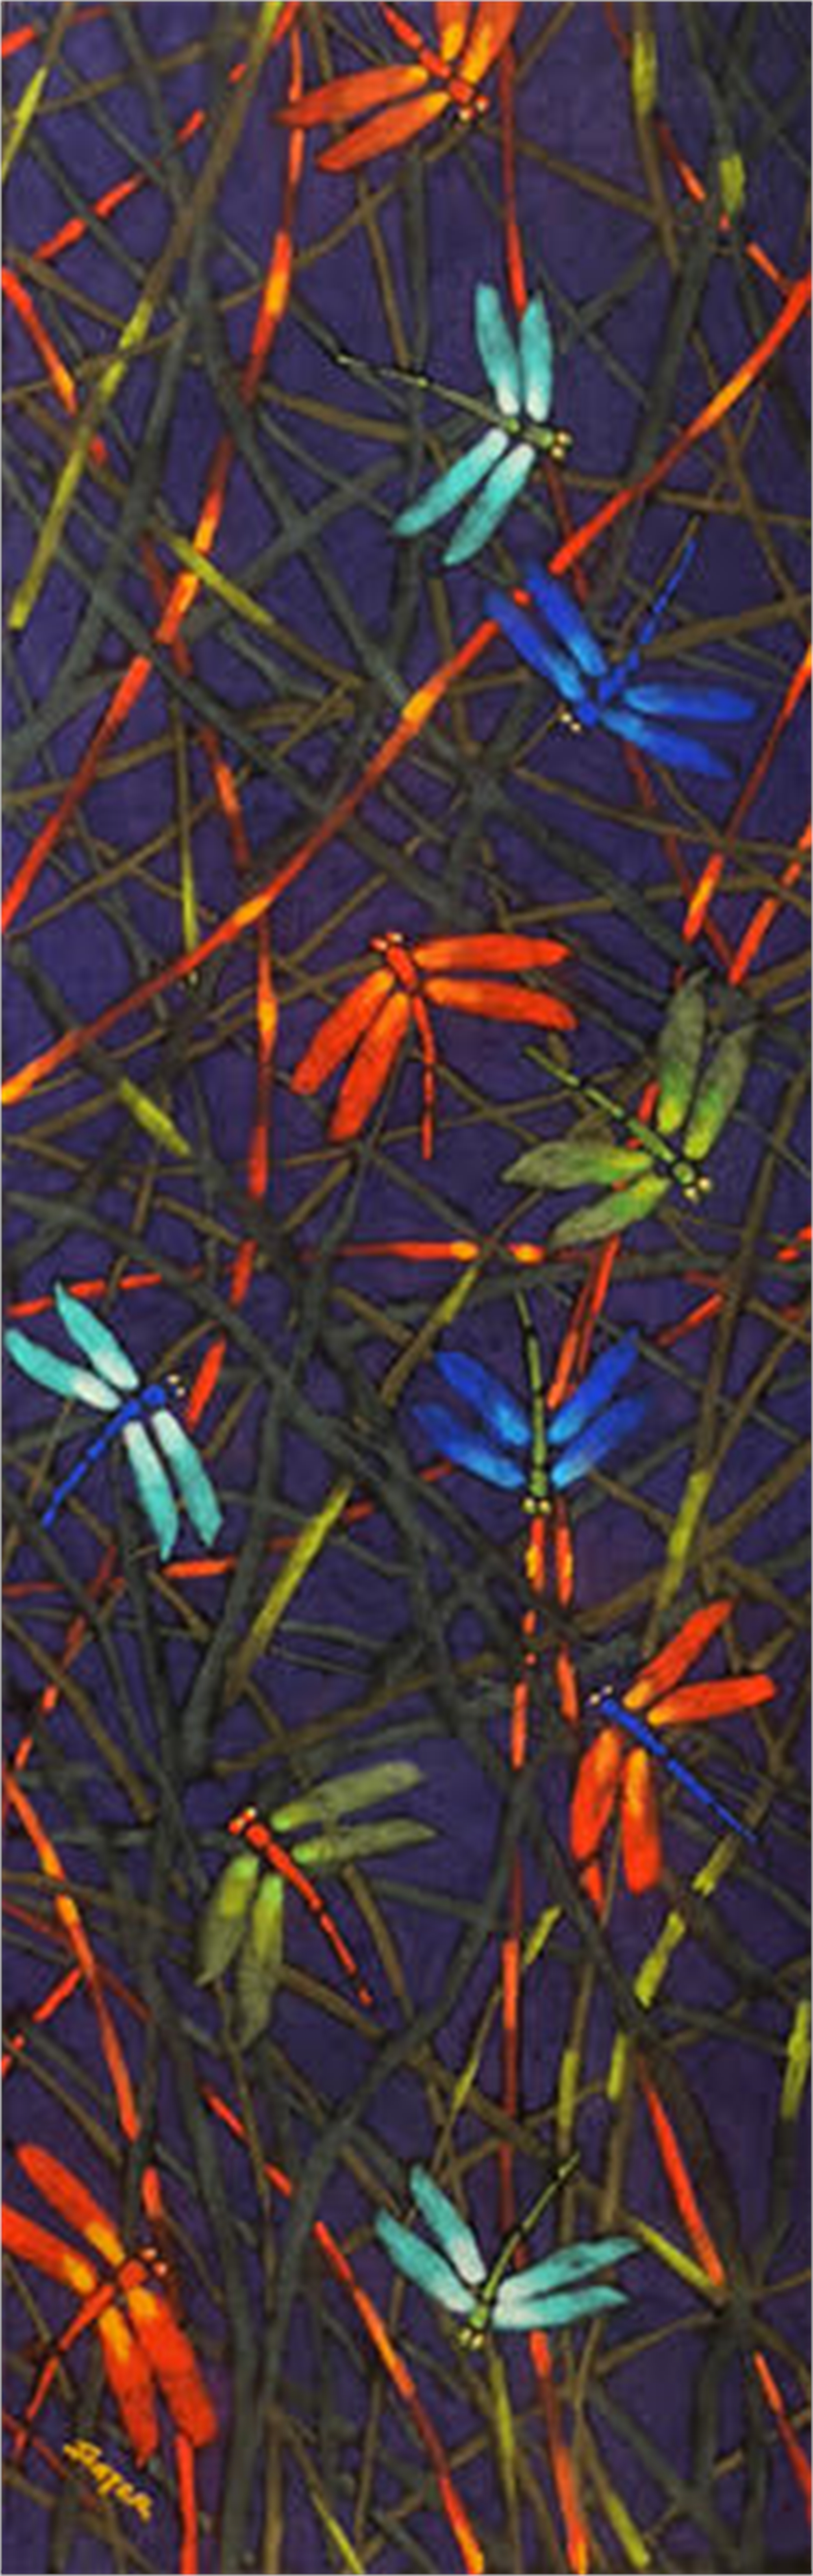 Dream Seekers by R. John Ichter